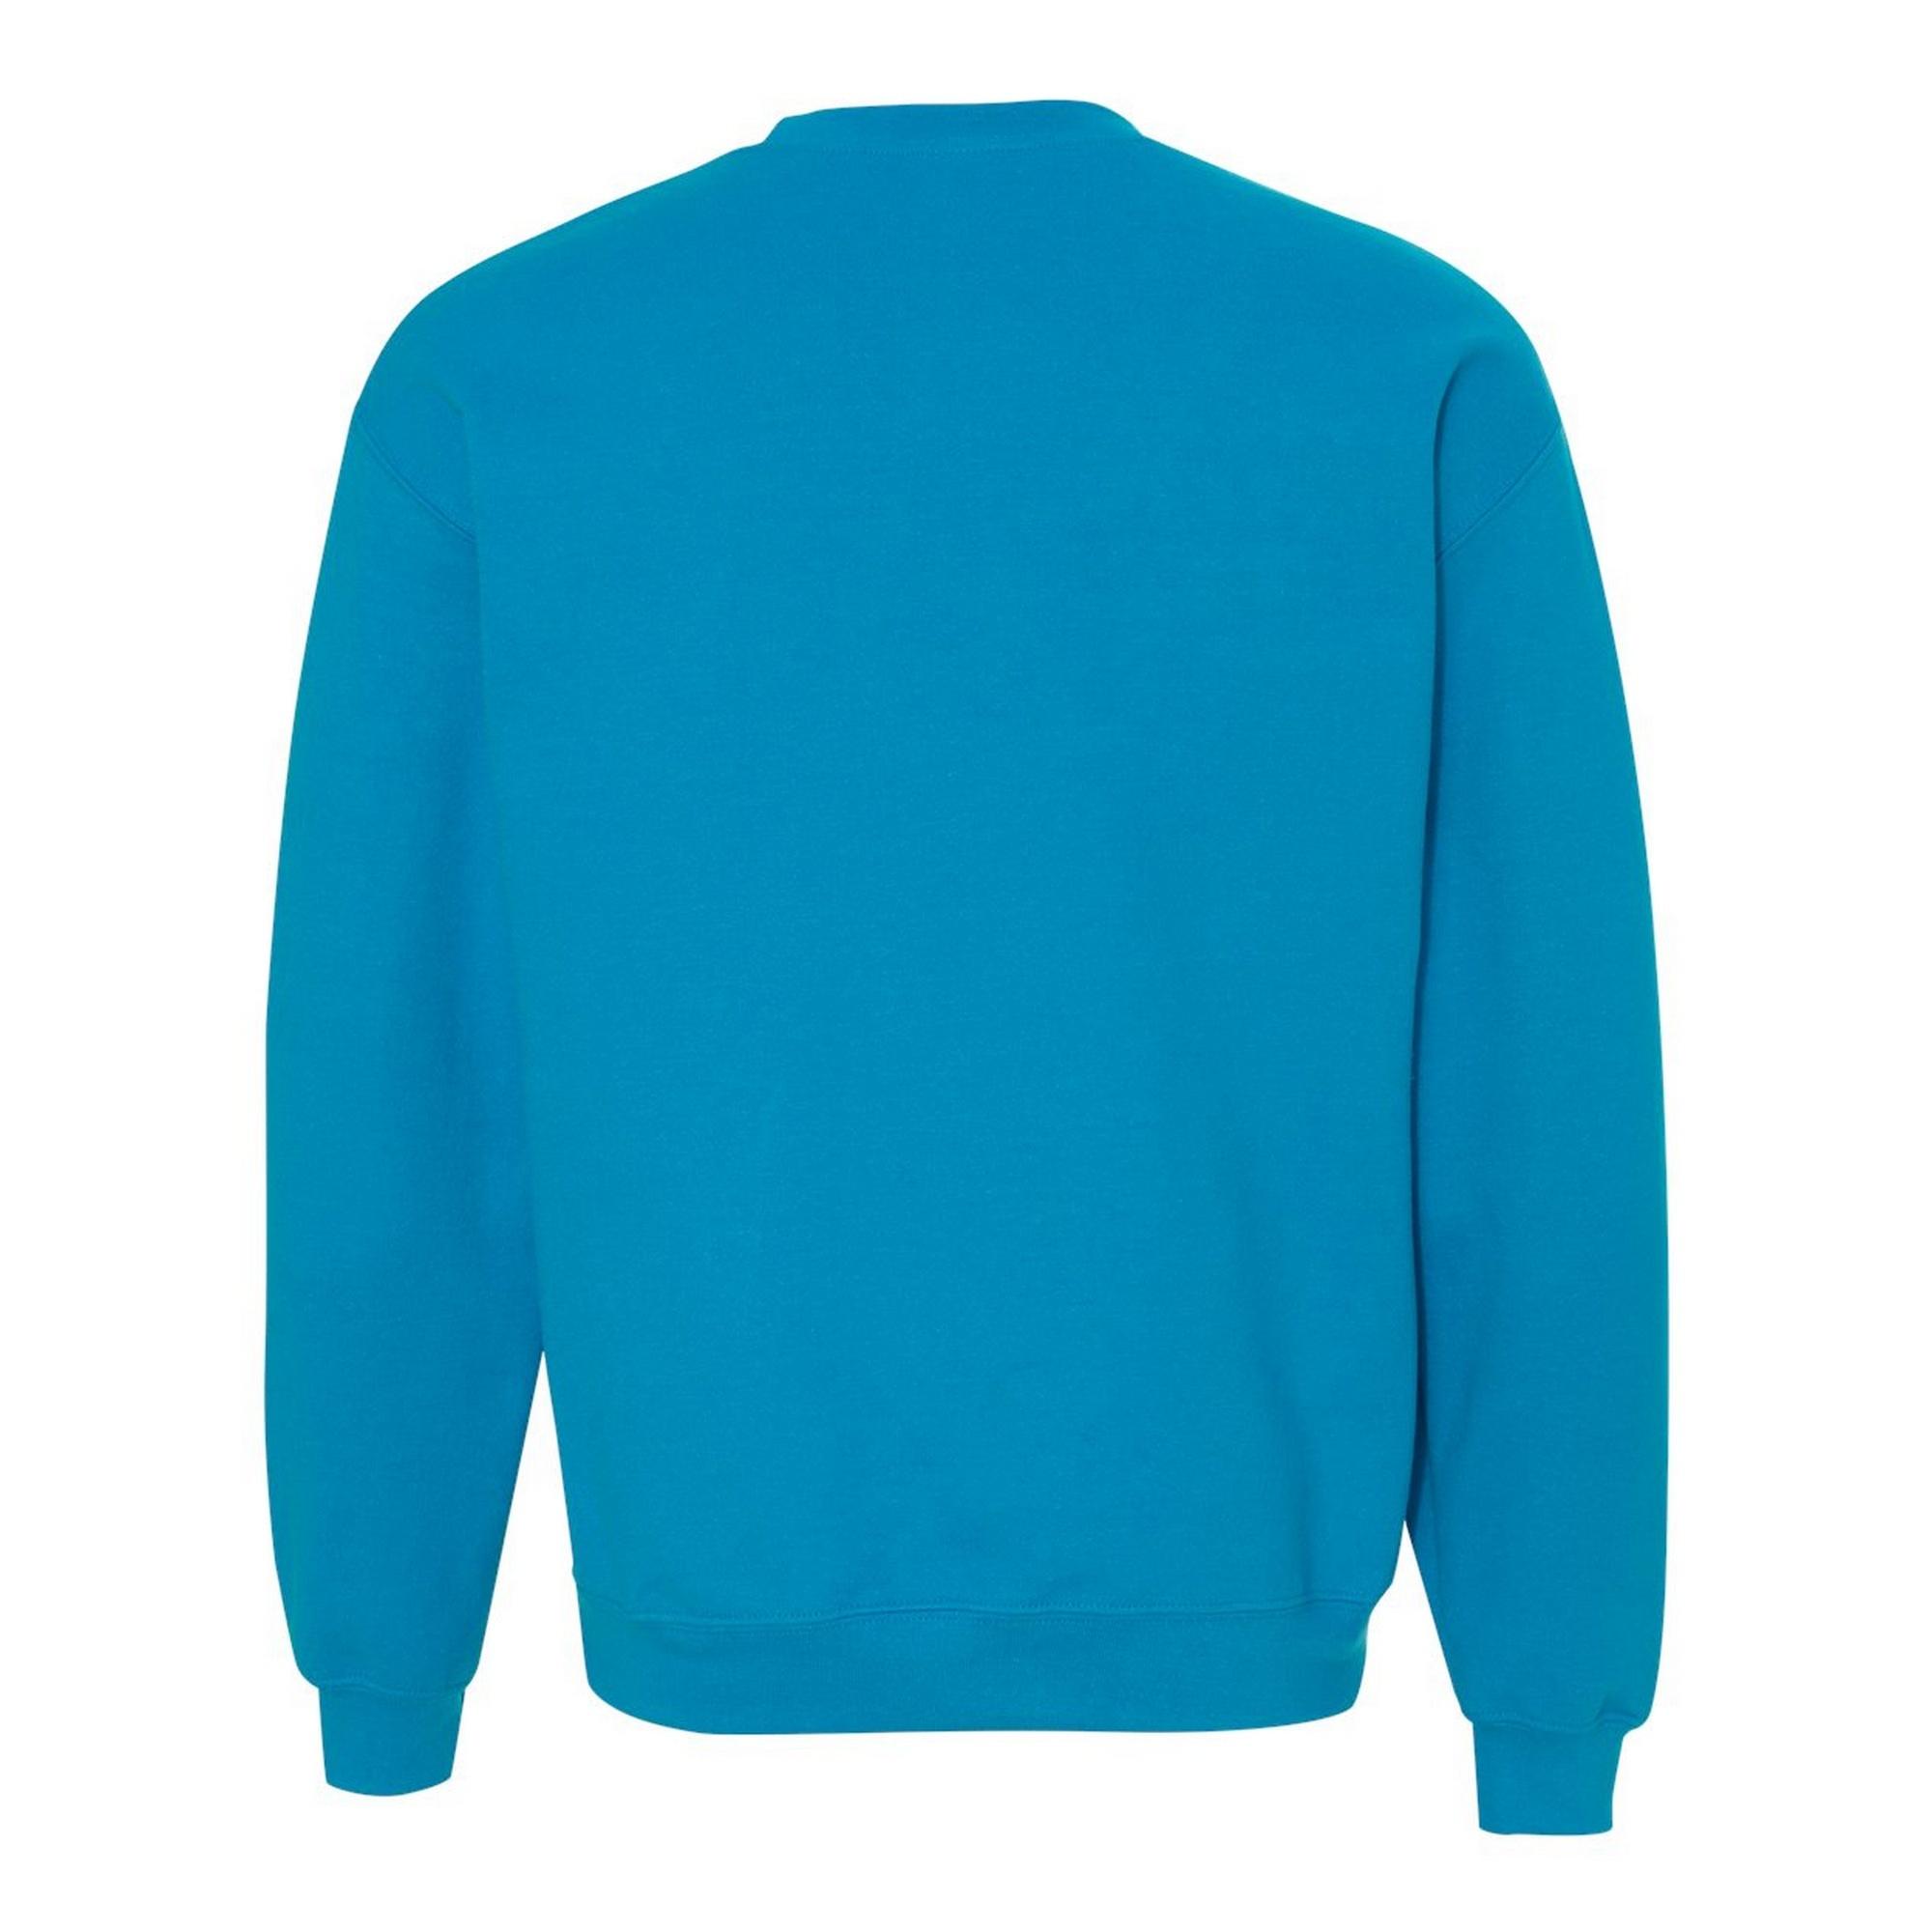 Gildan Heavy Blend Unisex Adult Crewneck Sweatshirt Ebay